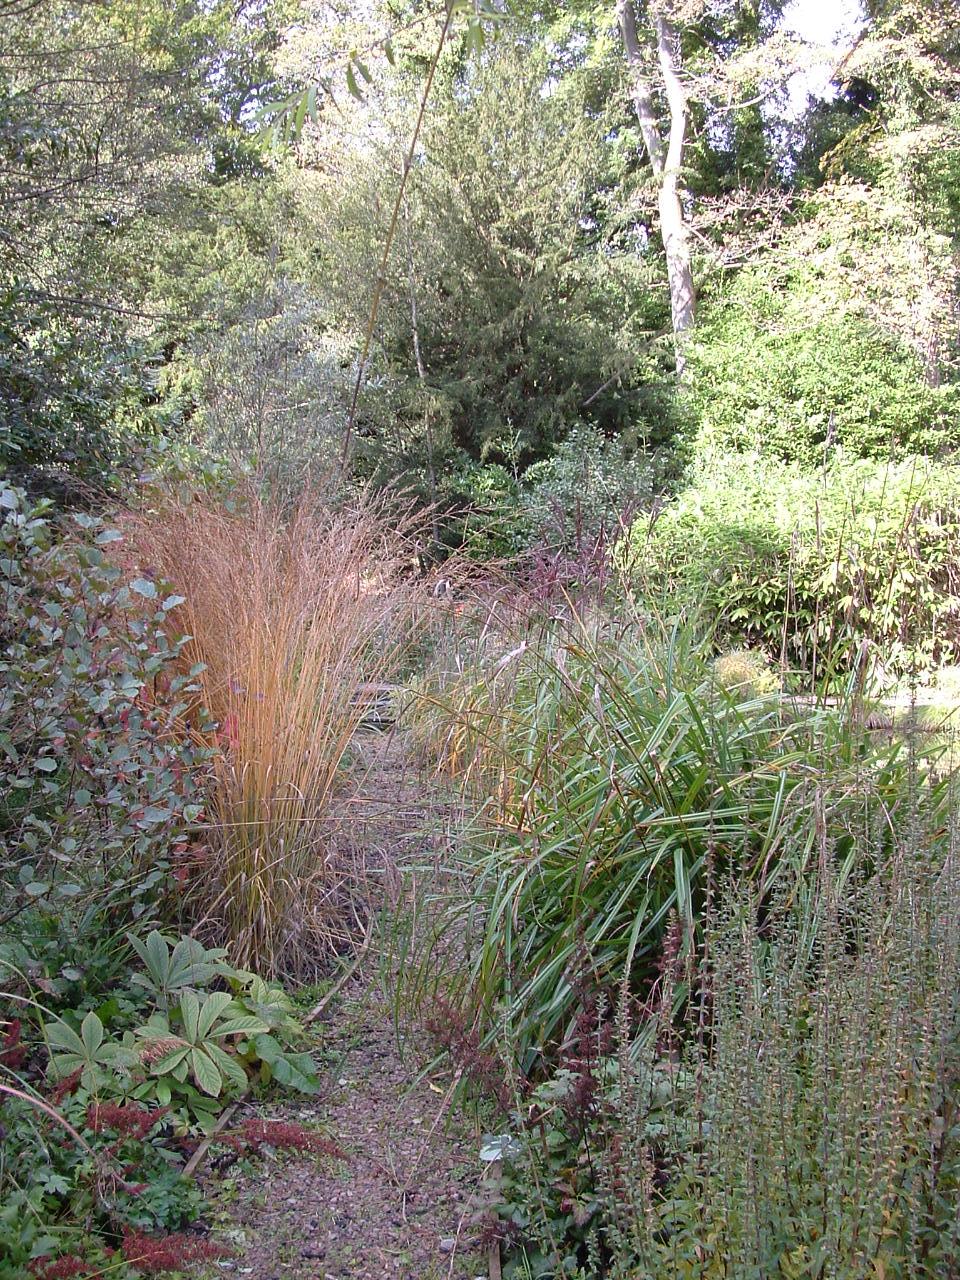 An autumn tinted Panicum grass forms a temporary focal point among lush woodland planting